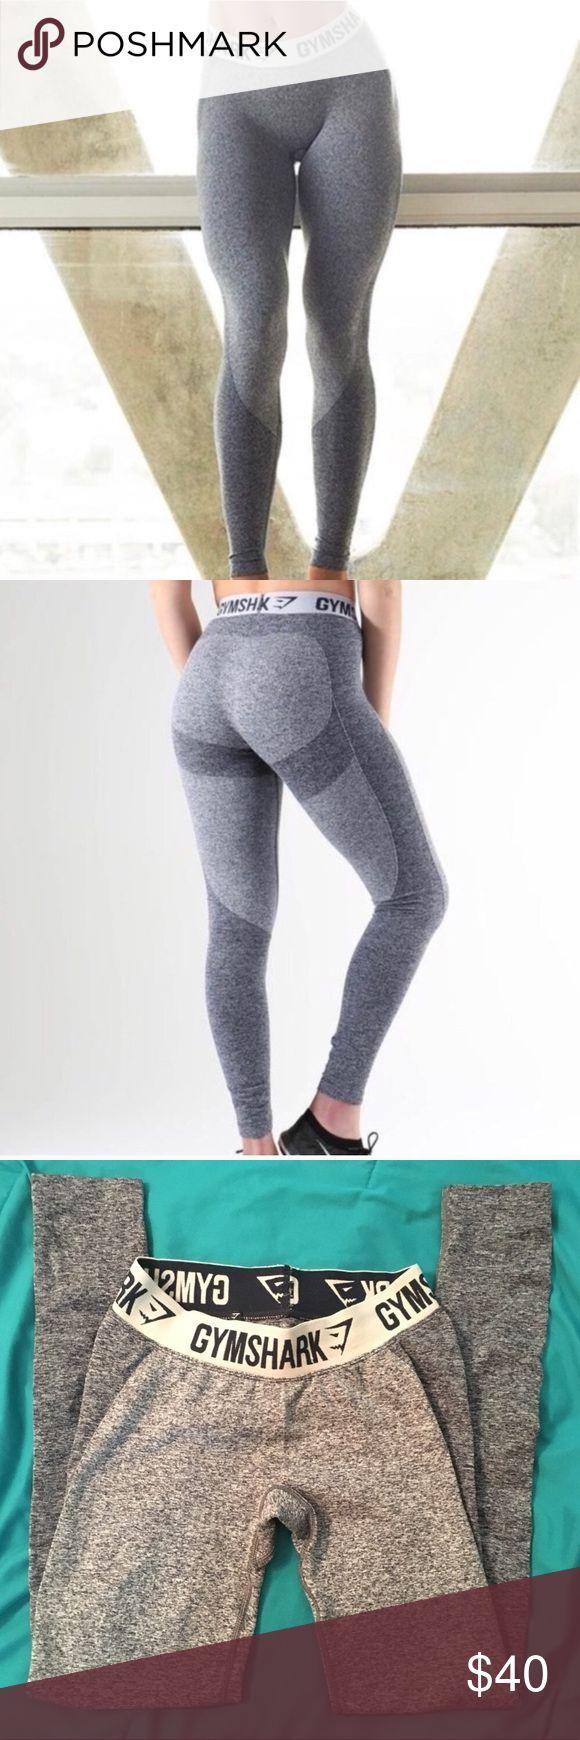 Gymshark flex leggings Sapphire blue and white leggings. Size small and true to size. Worn less than 5x Gymshark Pants Leggings